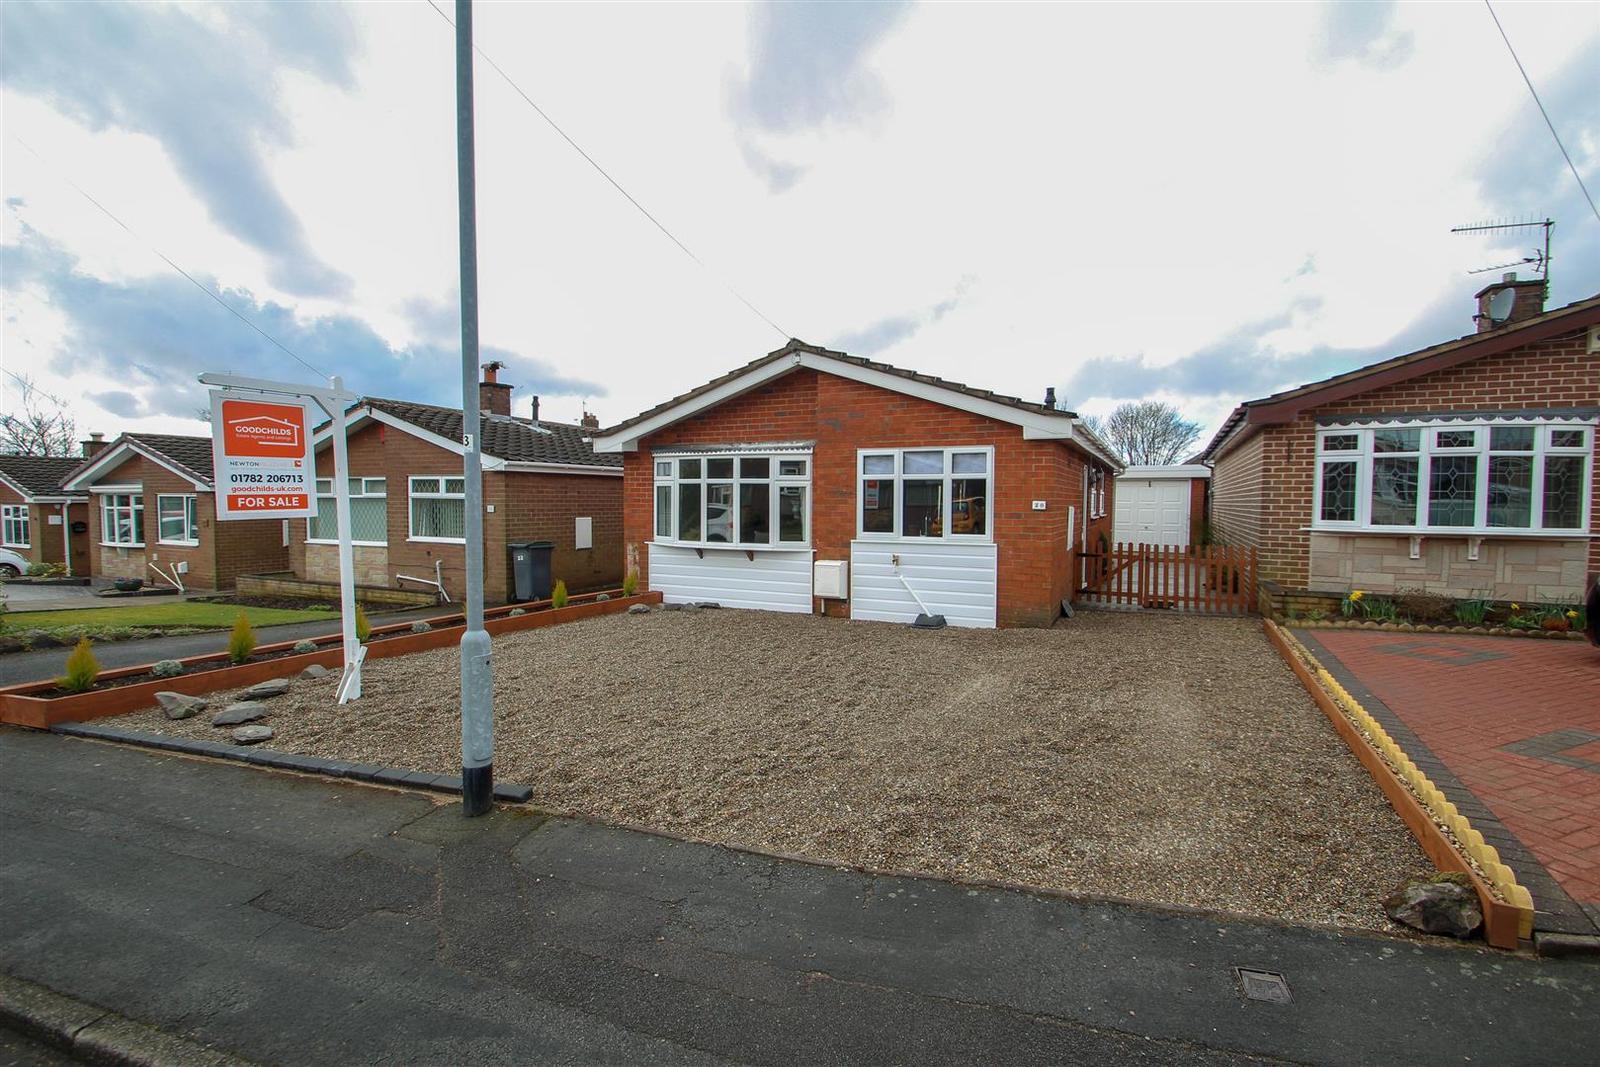 2 Bedroom Property For Sale In Sunningdale Close Burslem Stoke On